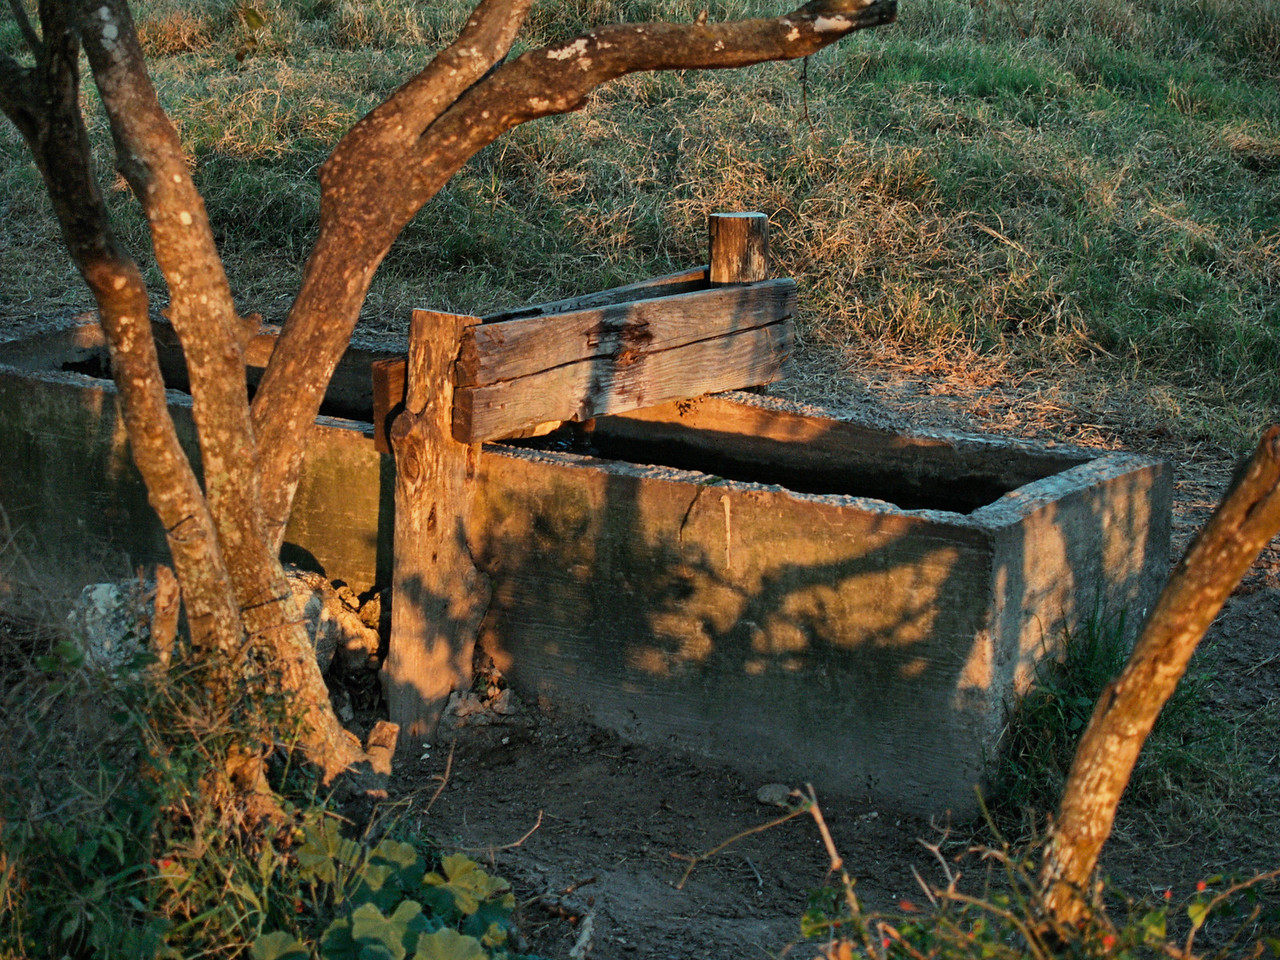 OLYMPUS DIGITAL CAMERA--Water trough in the heifer pasture.